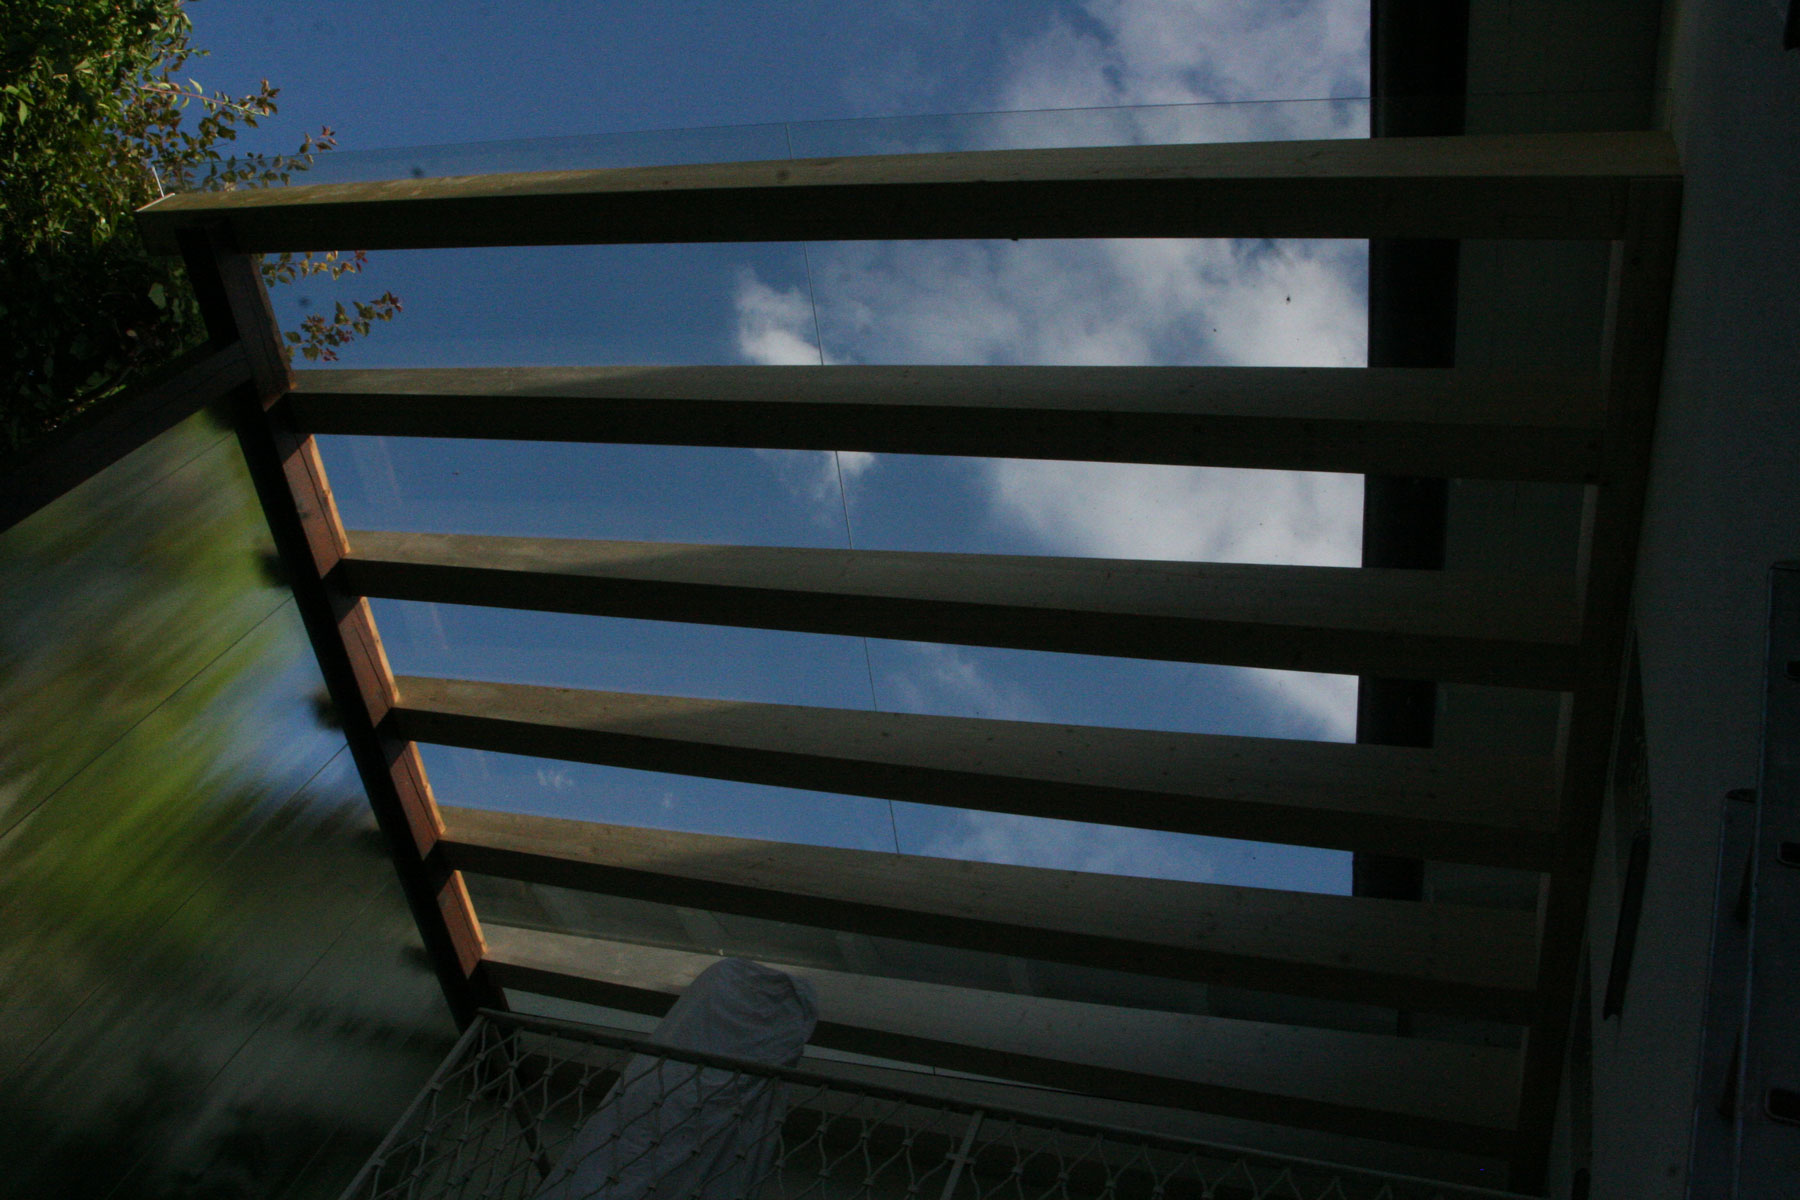 Sklenarstvi-Prerost-strechy-a- pristresky (8)